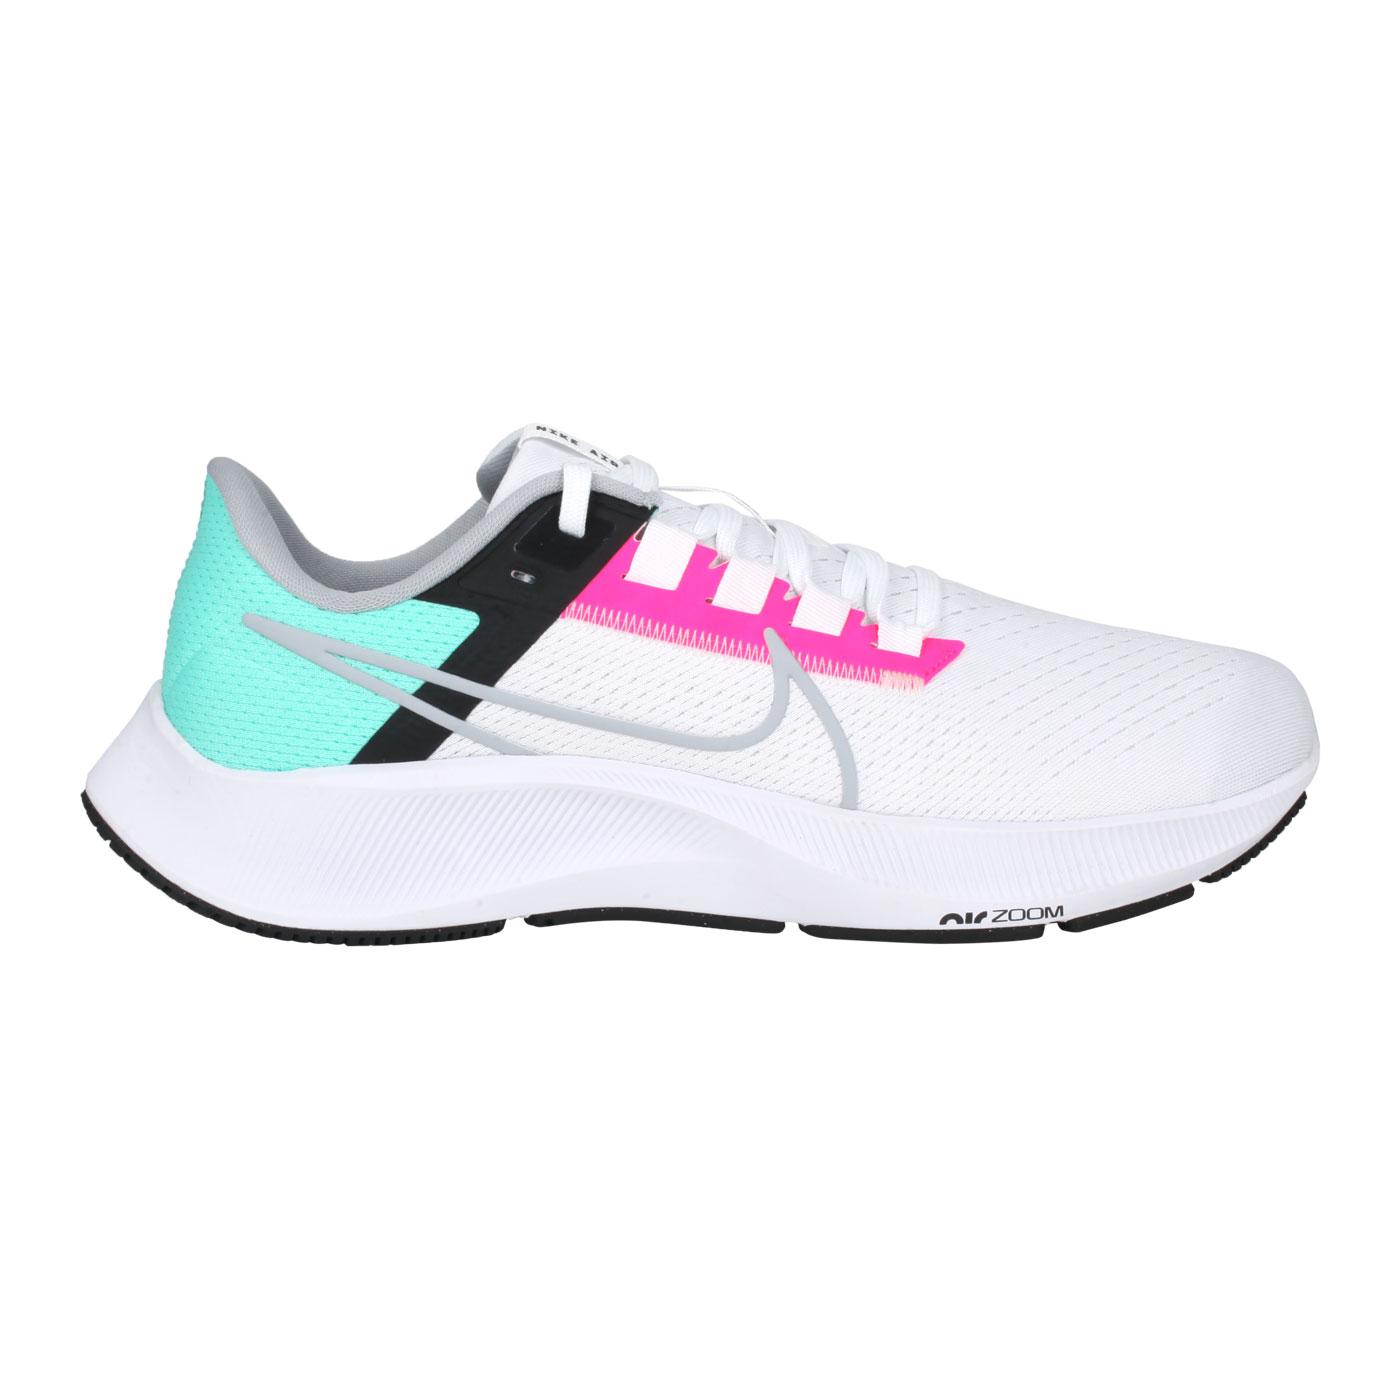 NIKE 男款慢跑鞋  @AIR ZOOM PEGASUS 38@CW7356-102 - 白桃紅綠黑